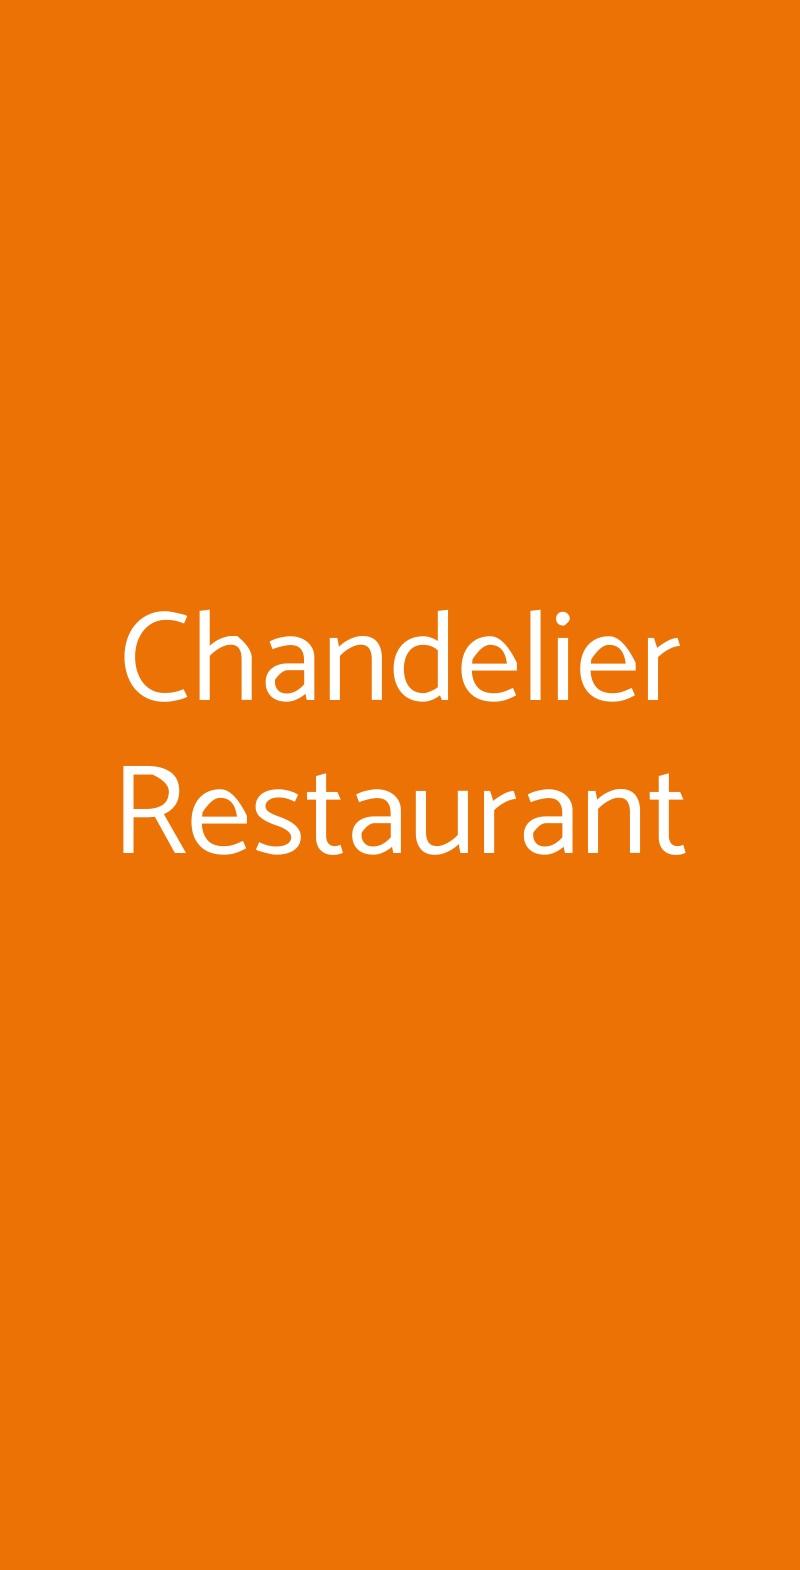 Chandelier Restaurant Napoli menù 1 pagina